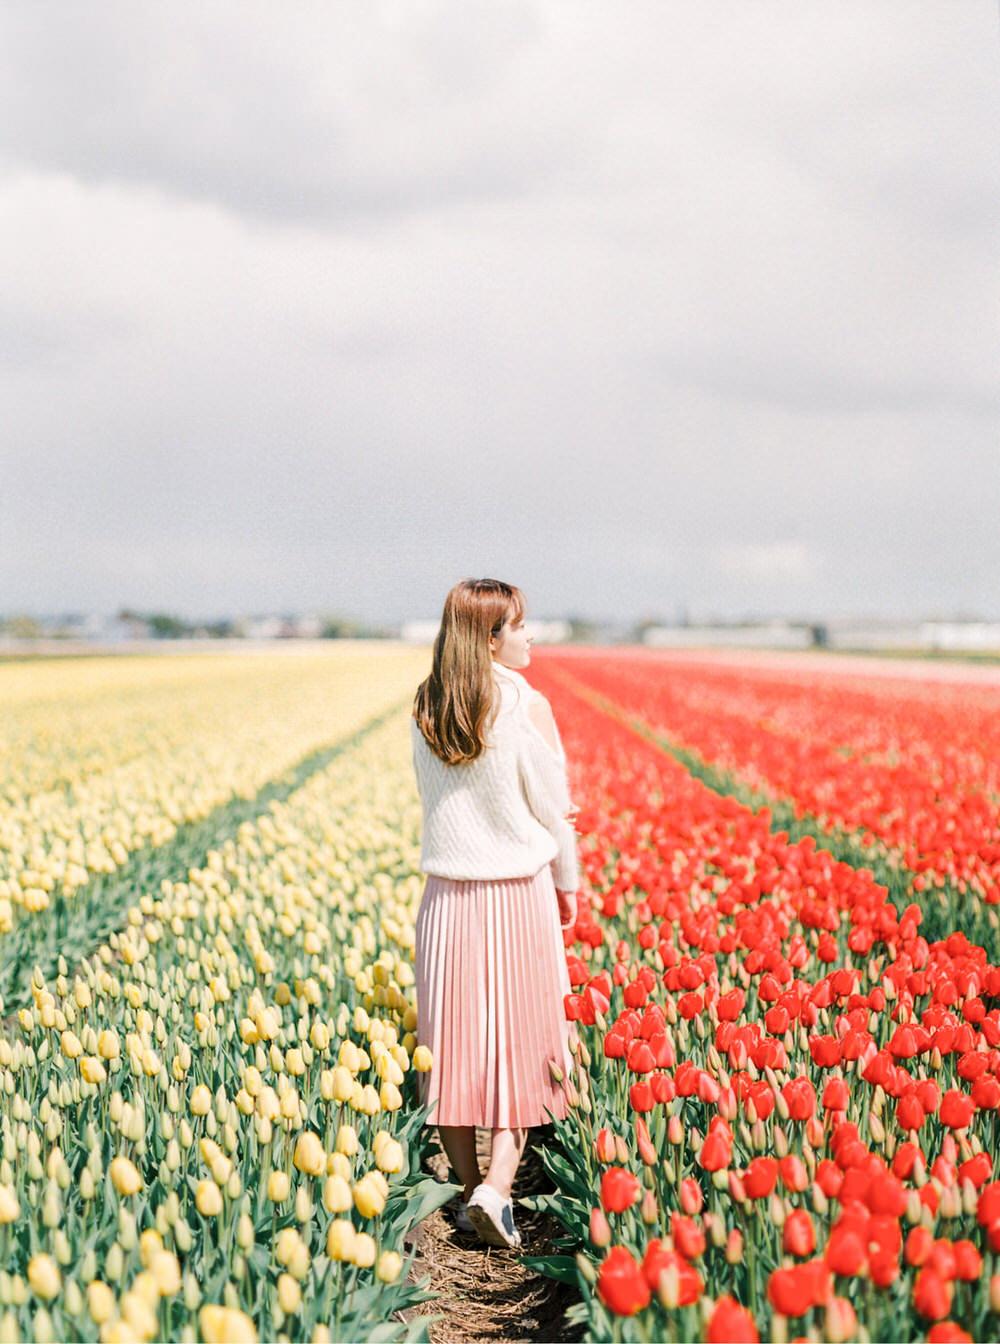 Netherlands Amsterdam Flower Field Portrait Photography - CHYMO